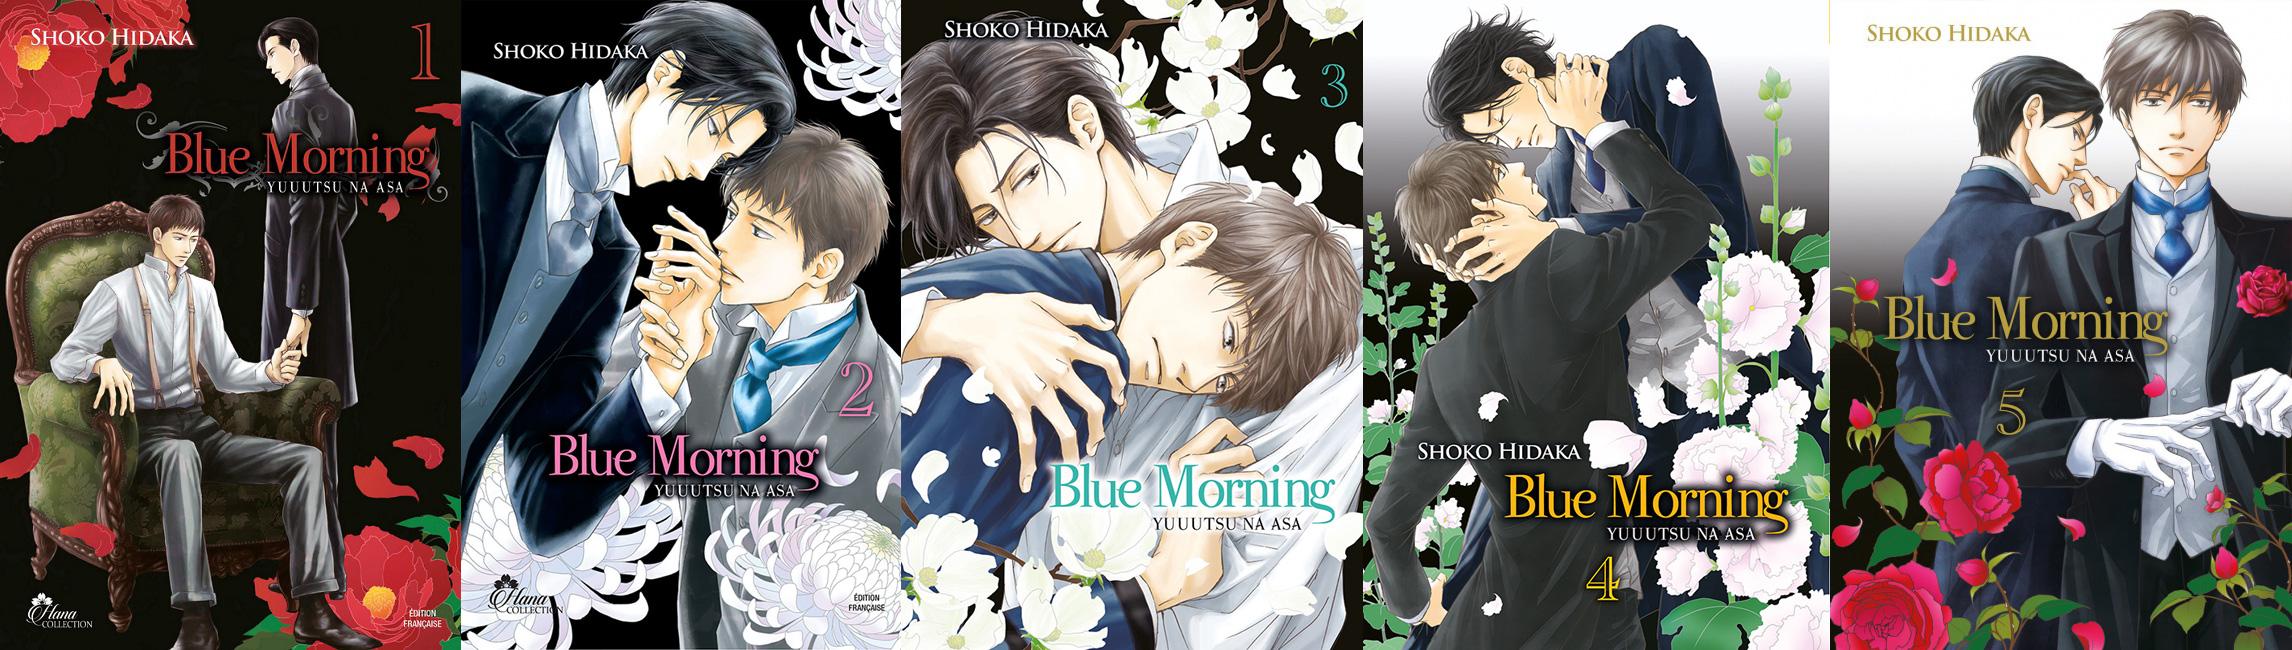 blue-morning-idp1-5